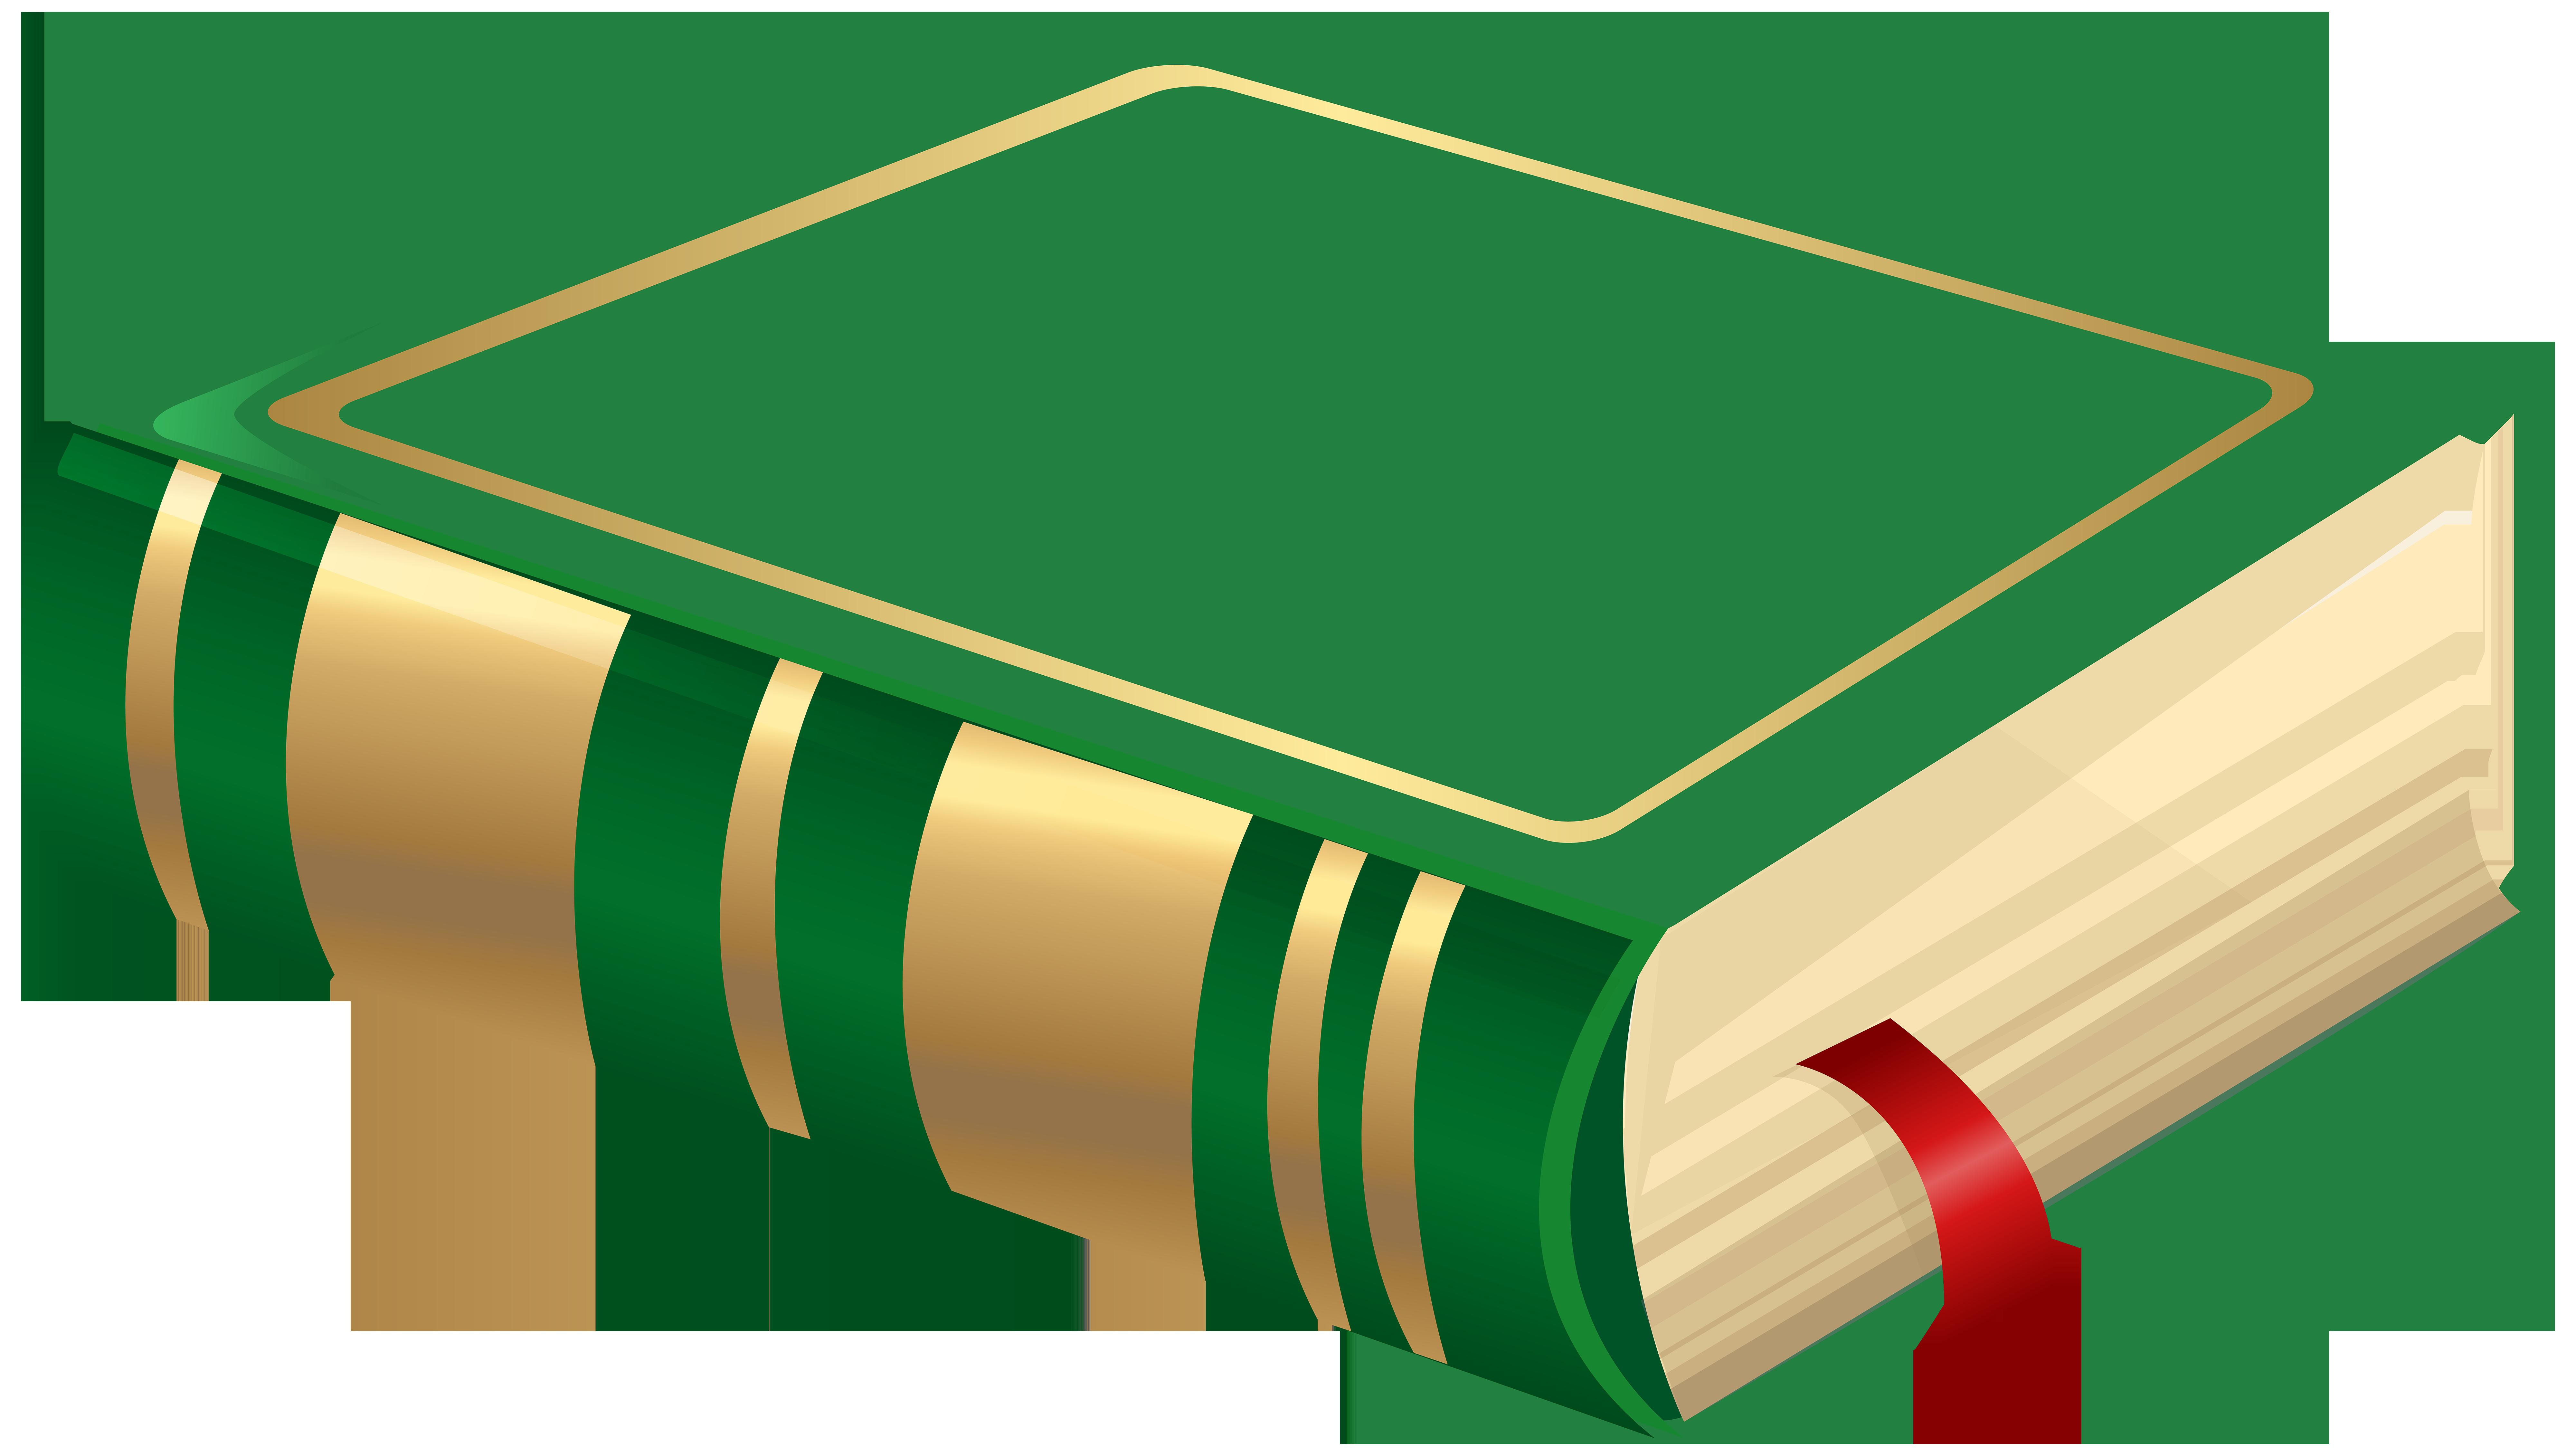 Green Book PNG Clip Art Image.